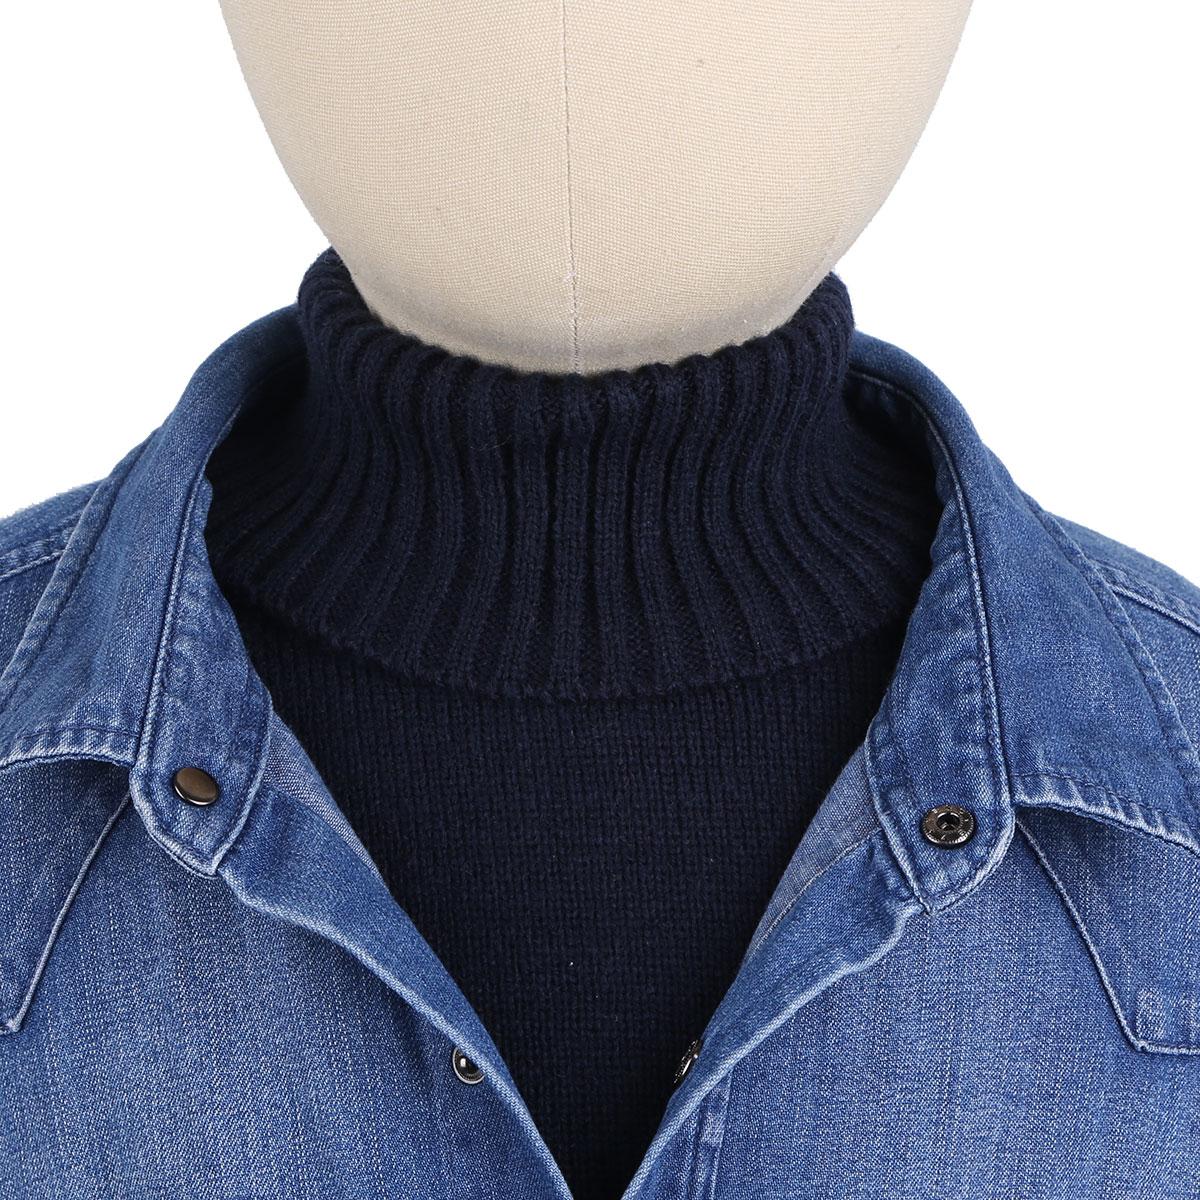 Latest Collection Of Baby Childrens Neck Gaiter Scarf Fake Collar Kraagjes Dames Baby Turtleneck Warmer Sweater Collar Neck Cover Lightweight Collar Boy's Tie Apparel Accessories